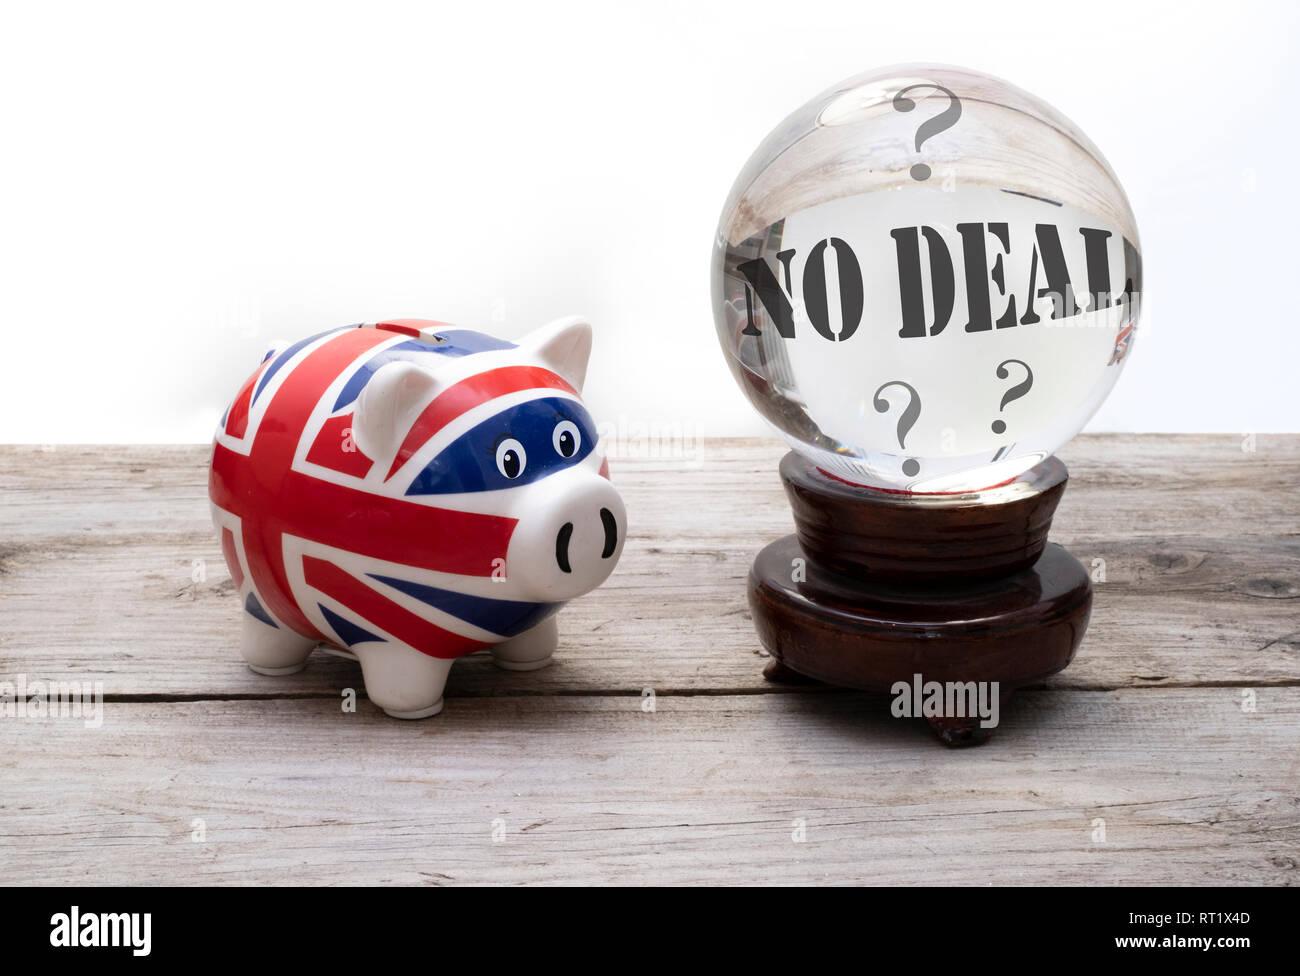 British Political Crisis Stock Photos & British Political Crisis